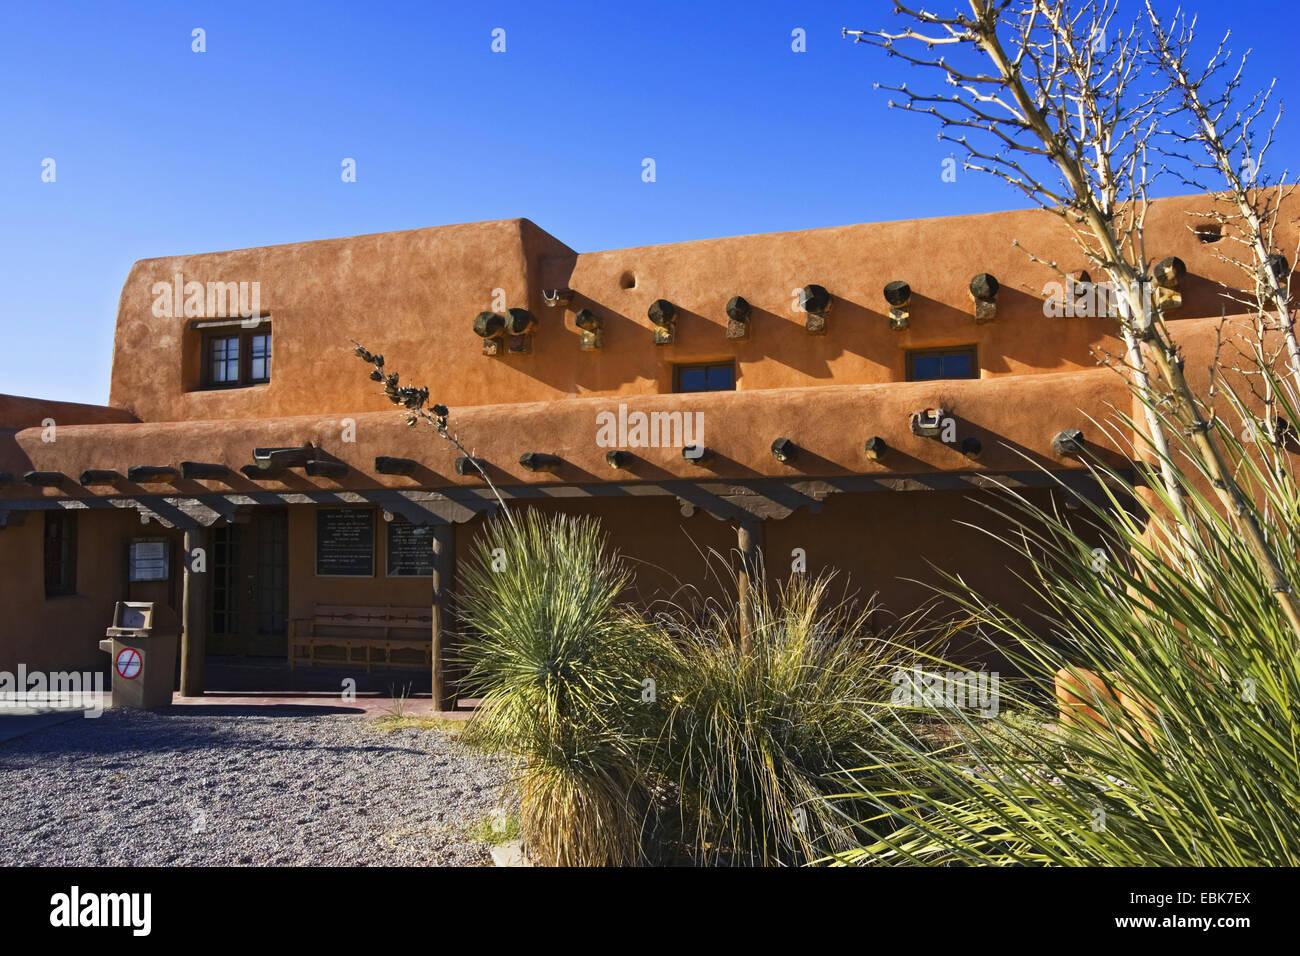 Visitor Center of White Sands National Monument, USA, New Mexico, White Sands National Monument - Stock Image